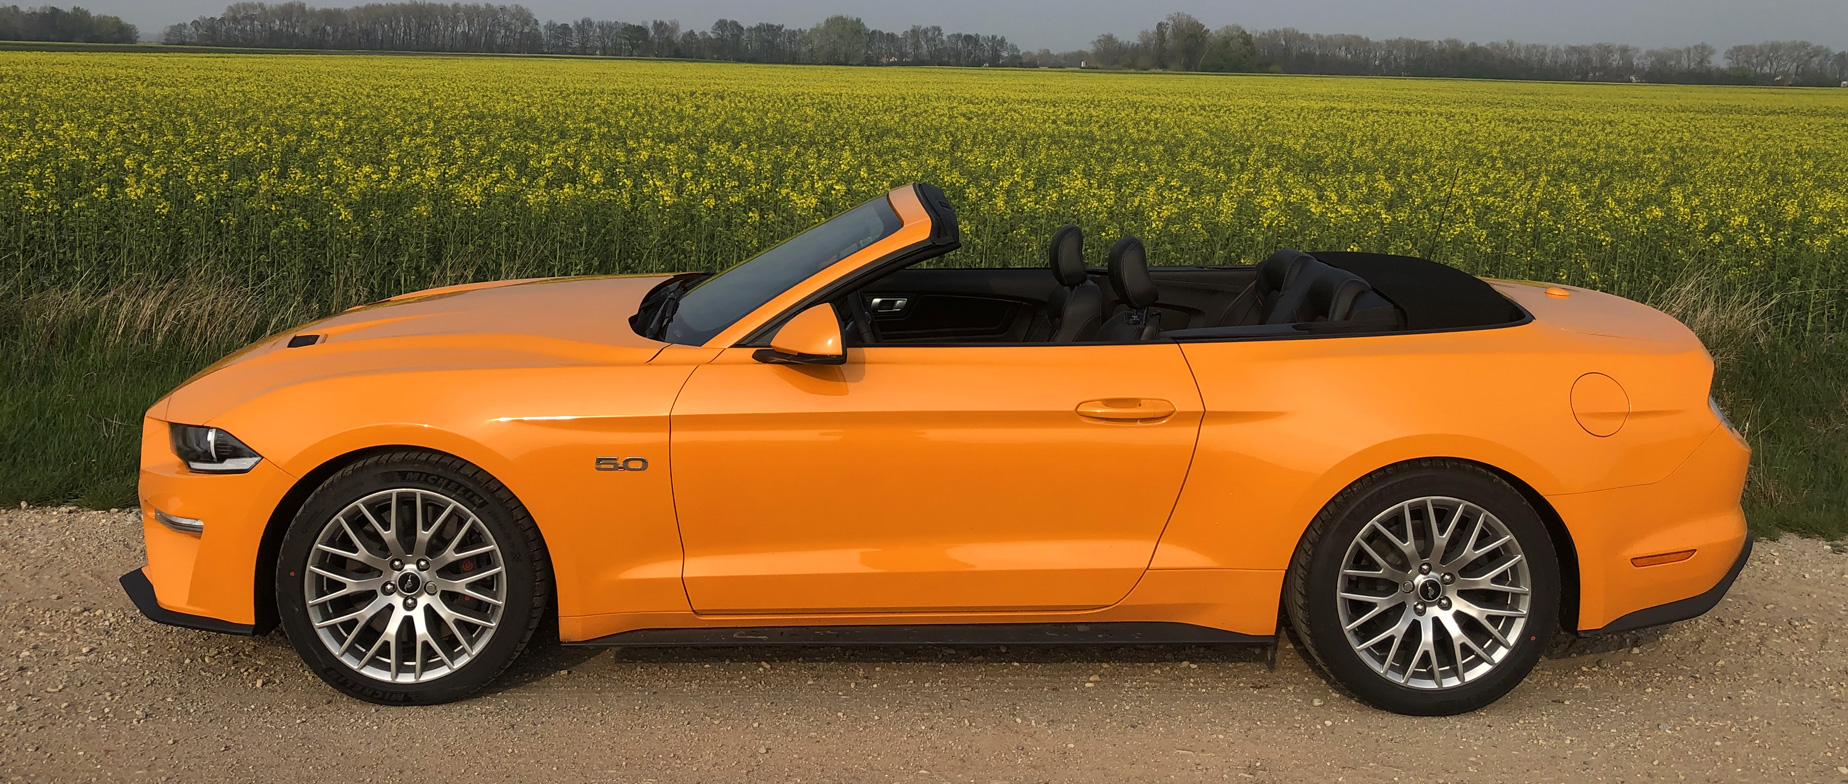 Ford Mustang Convertible GT 5.0 V8 élményvezetés